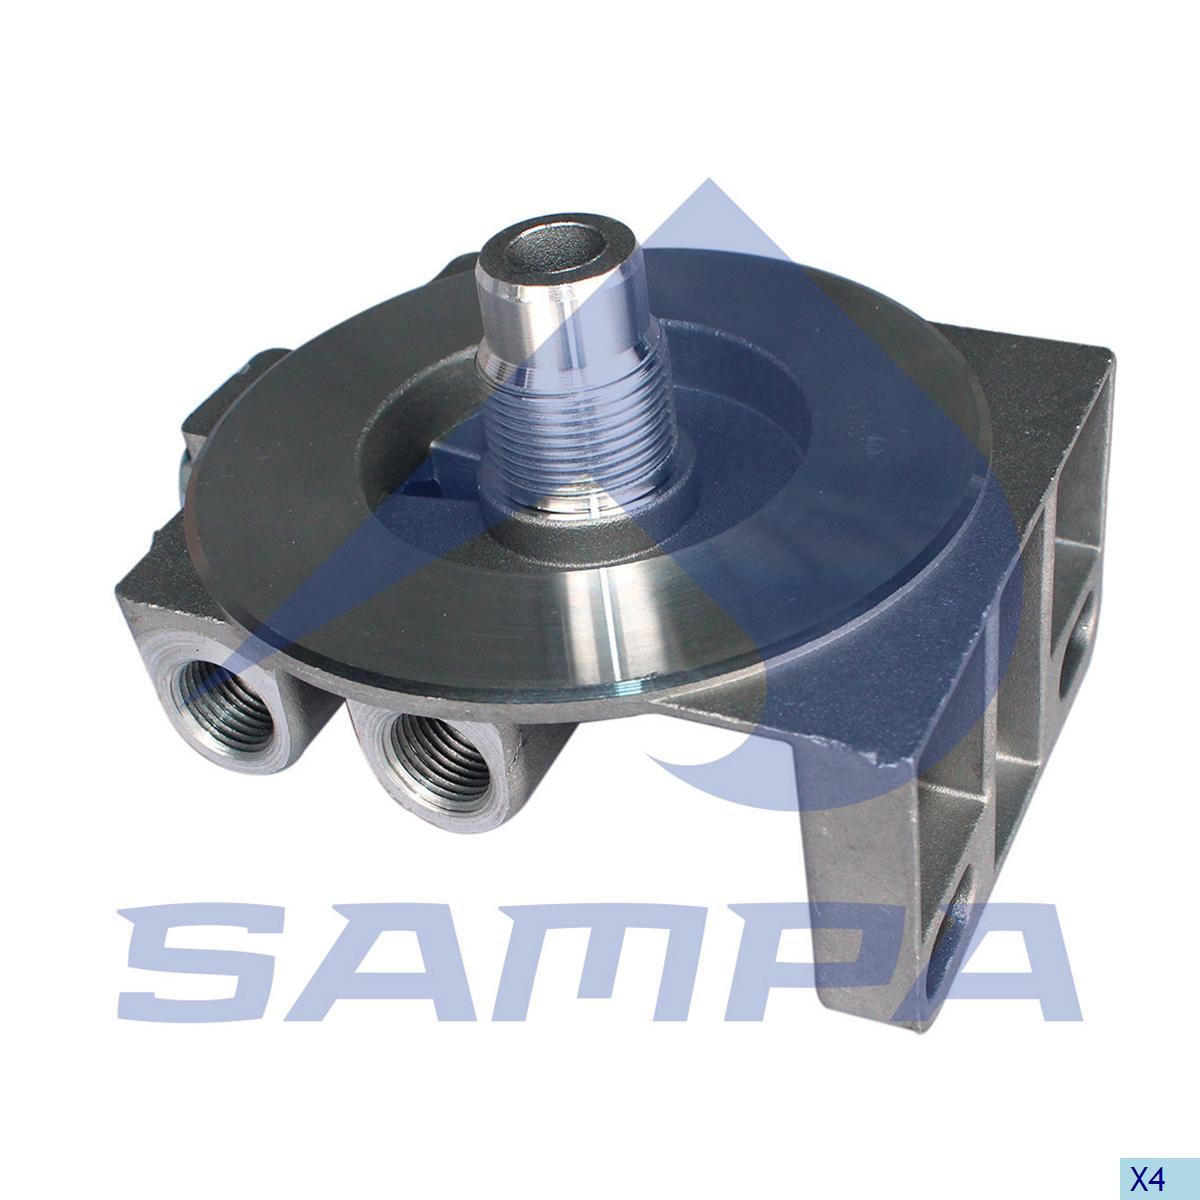 Head, Fuel Filter, Volvo, Engine